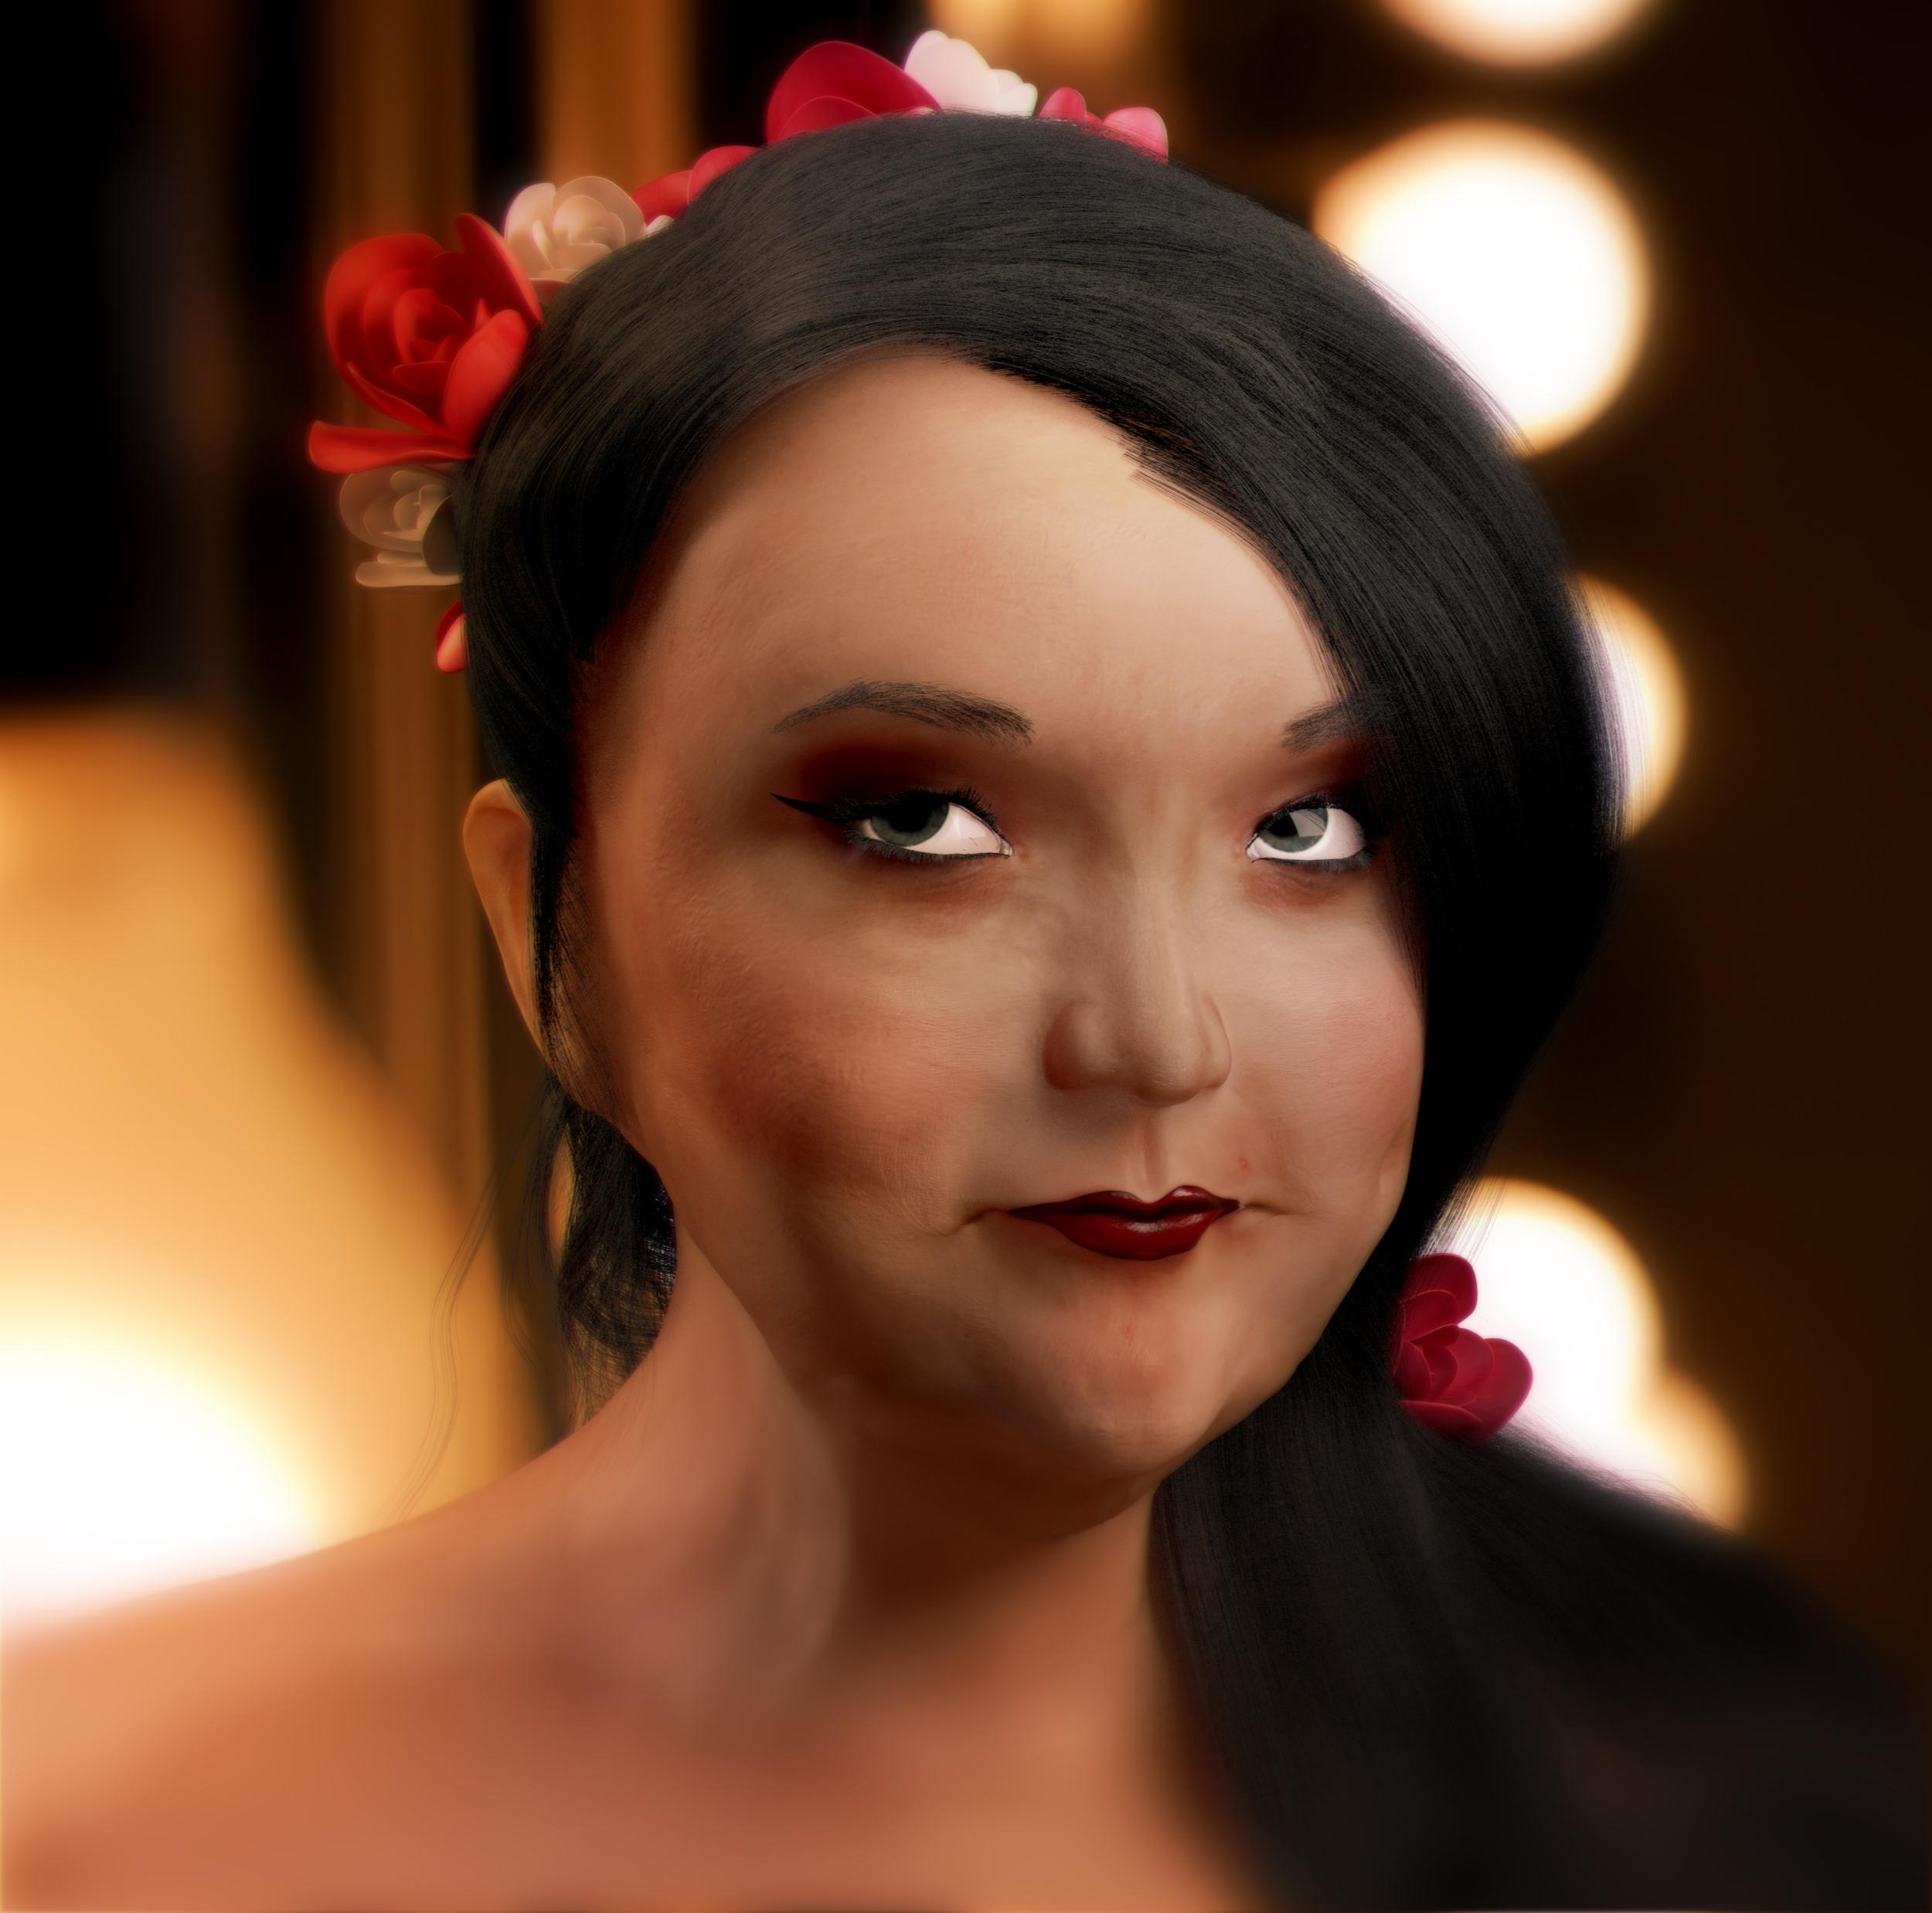 Лера 3D (Портрет, WIP)